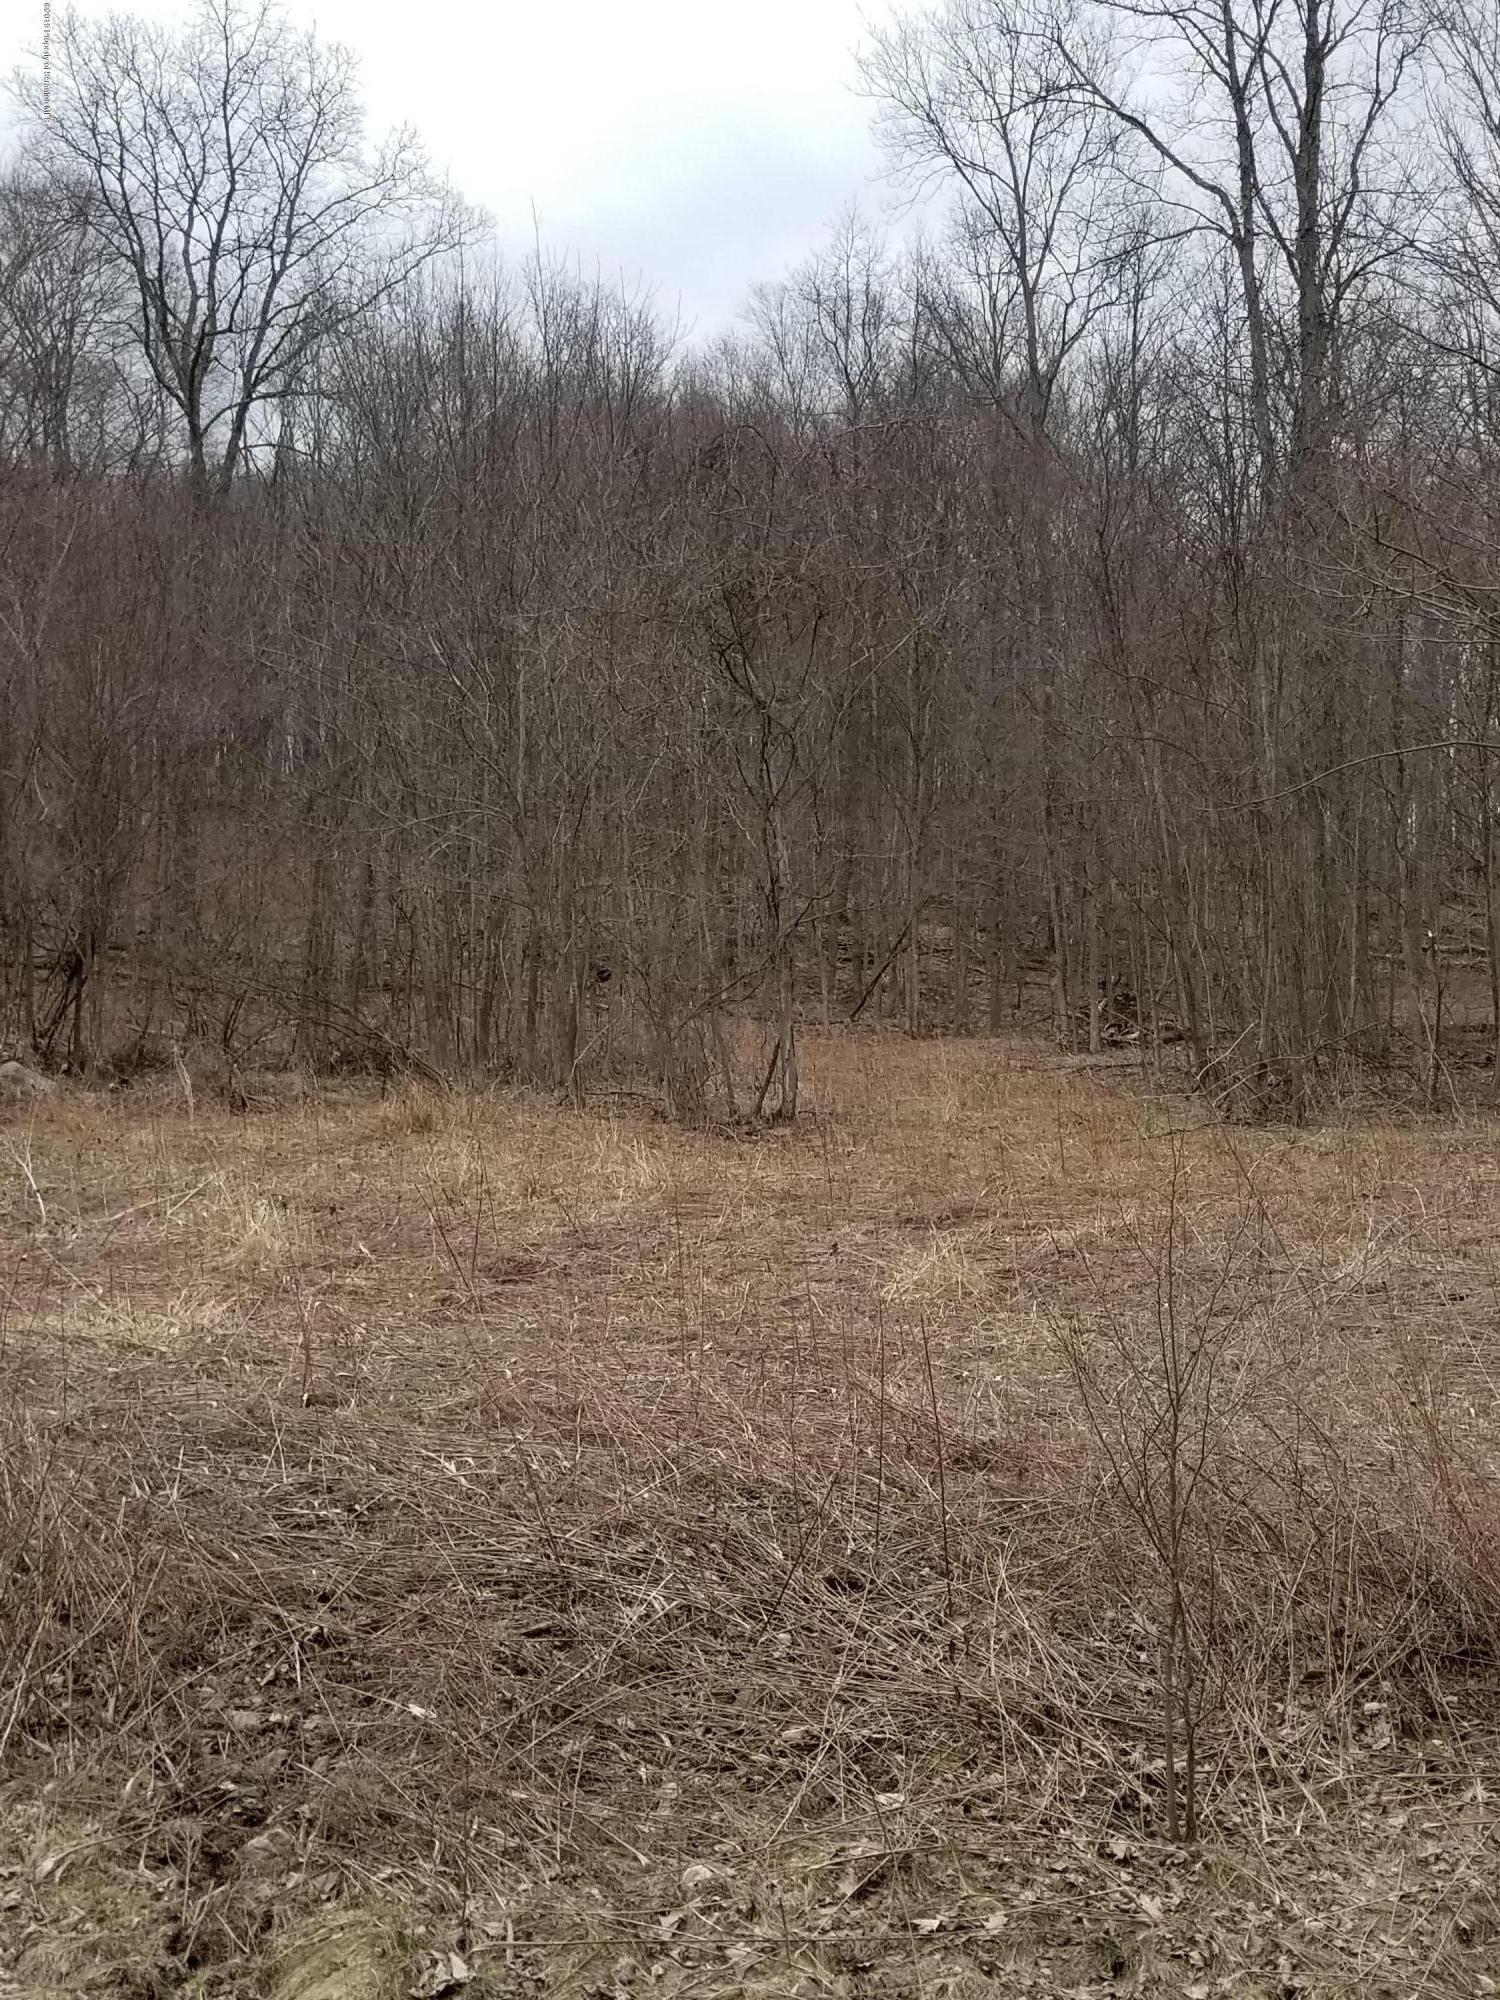 32 T 562 Spedding Farm L 32, Carbondale, Pennsylvania 18407, ,Land,For Sale,T 562 Spedding Farm L 32,19-1567